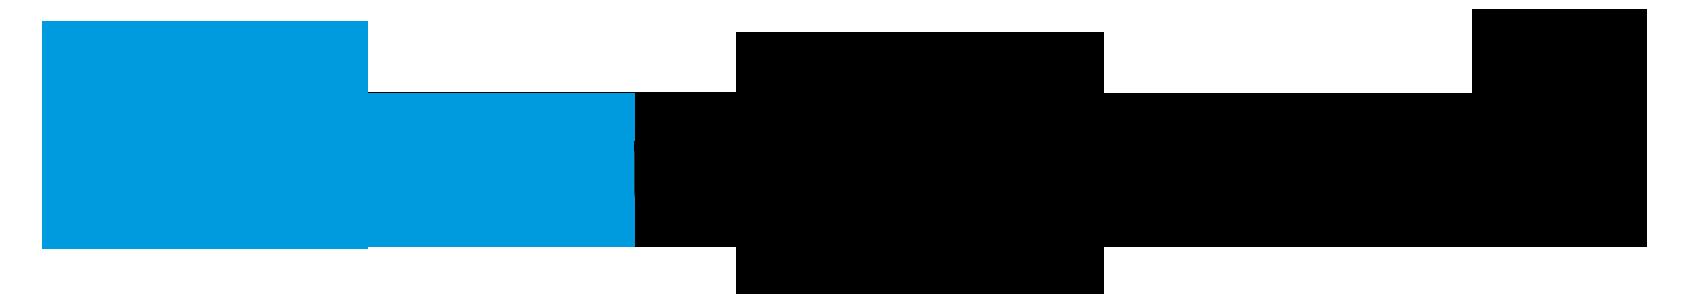 Logo_bimobject_AR_senza_sfondo